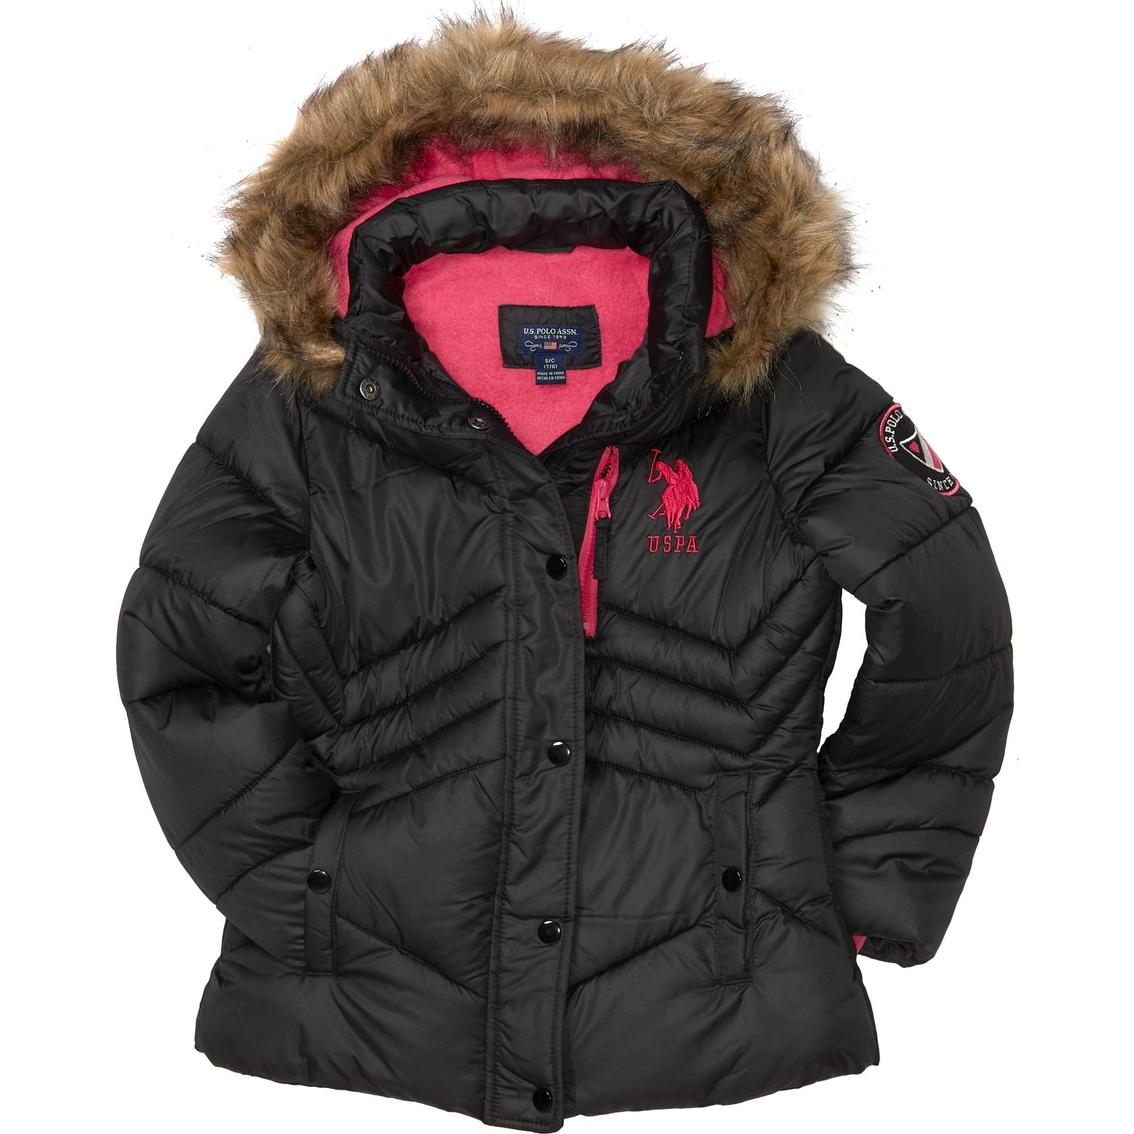 Girls Bubble Jacket U.S Polo Assn